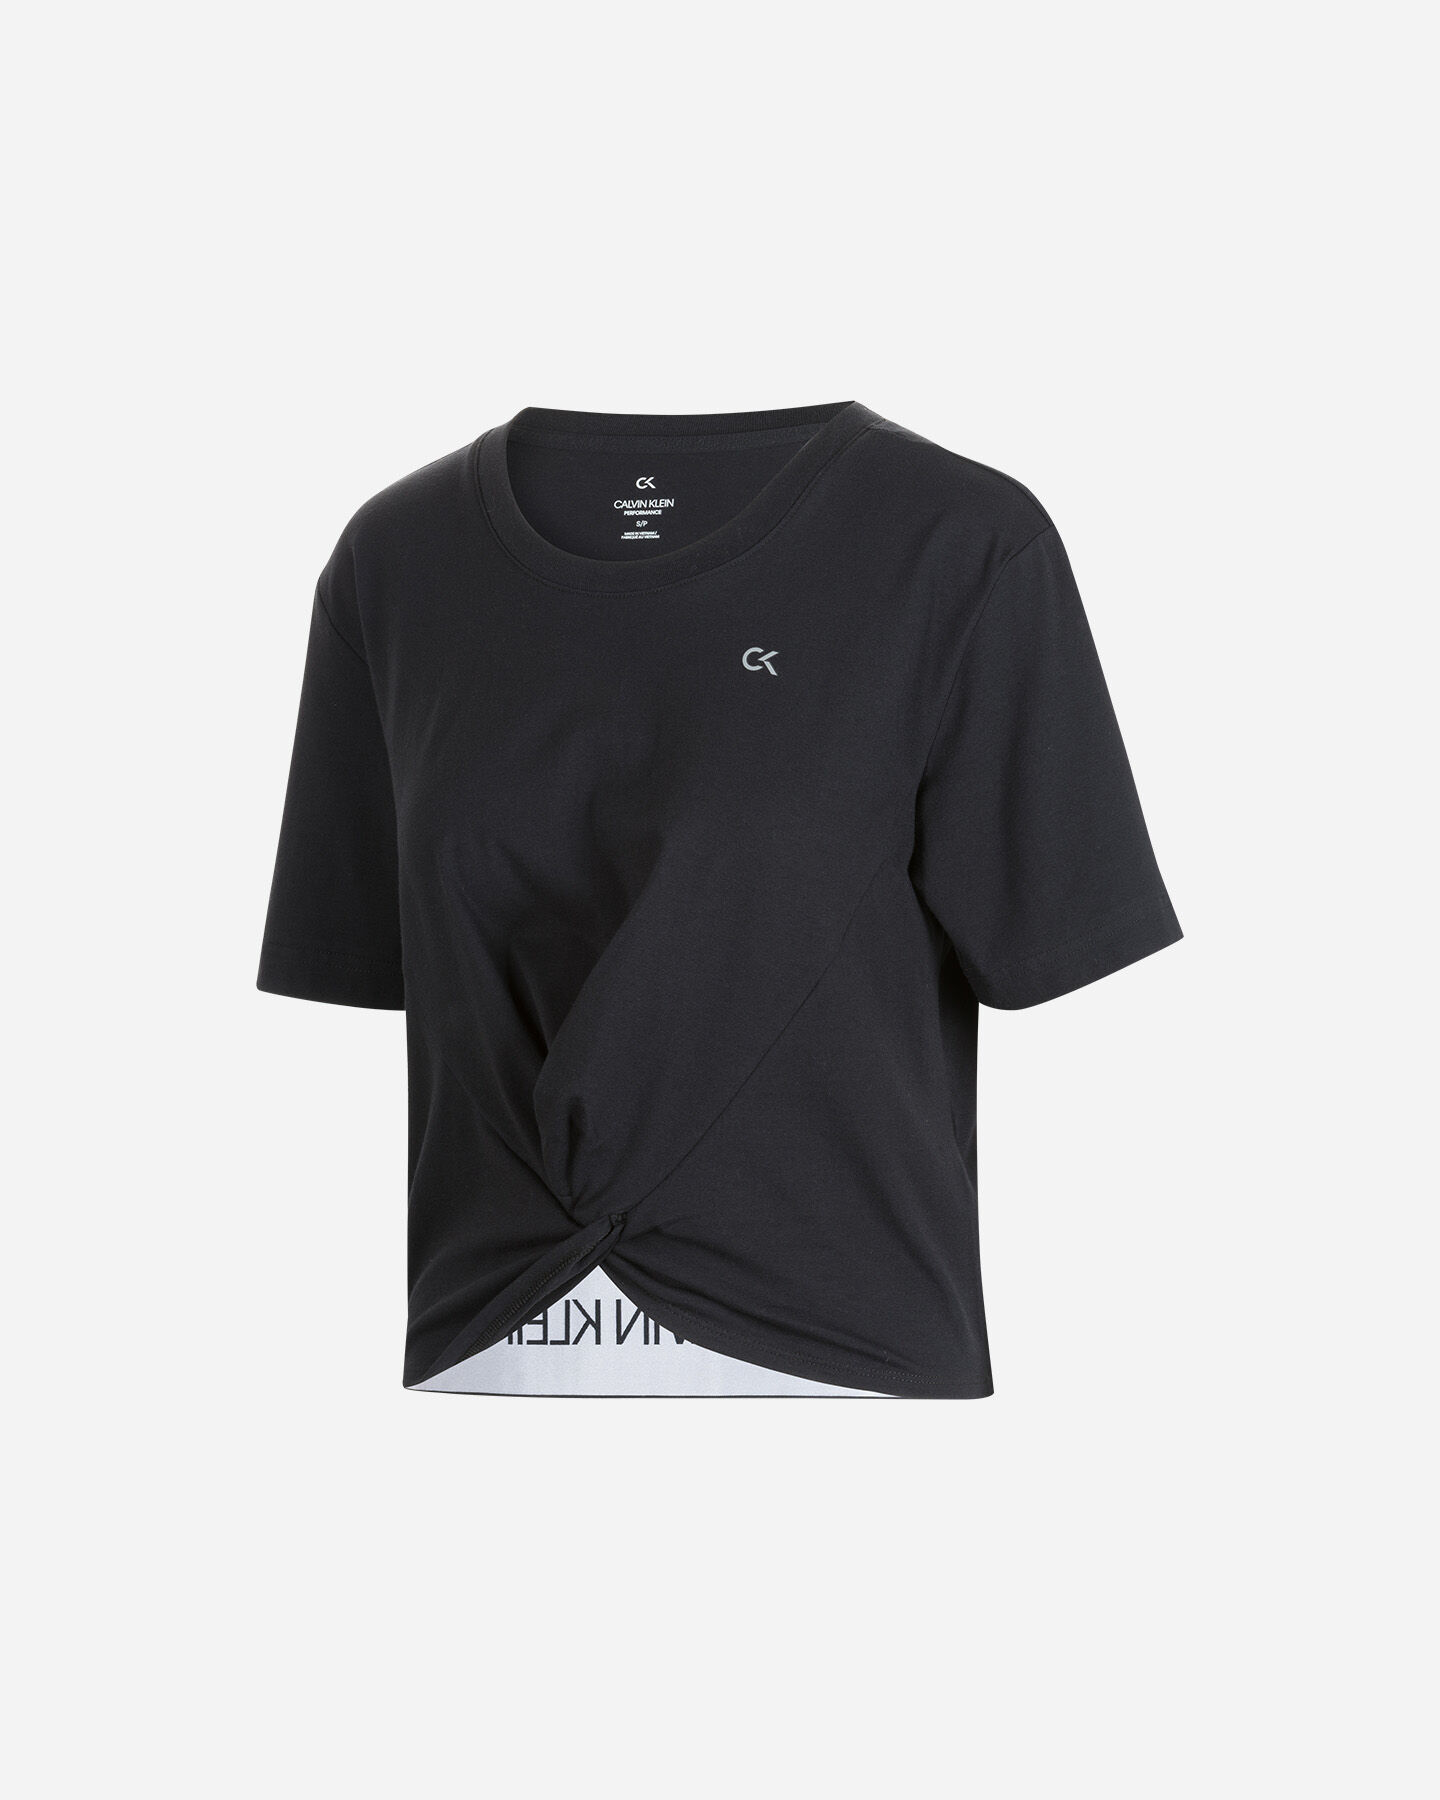 T-Shirt CALVIN KLEIN LOGO RETRO W S4079709 scatto 0